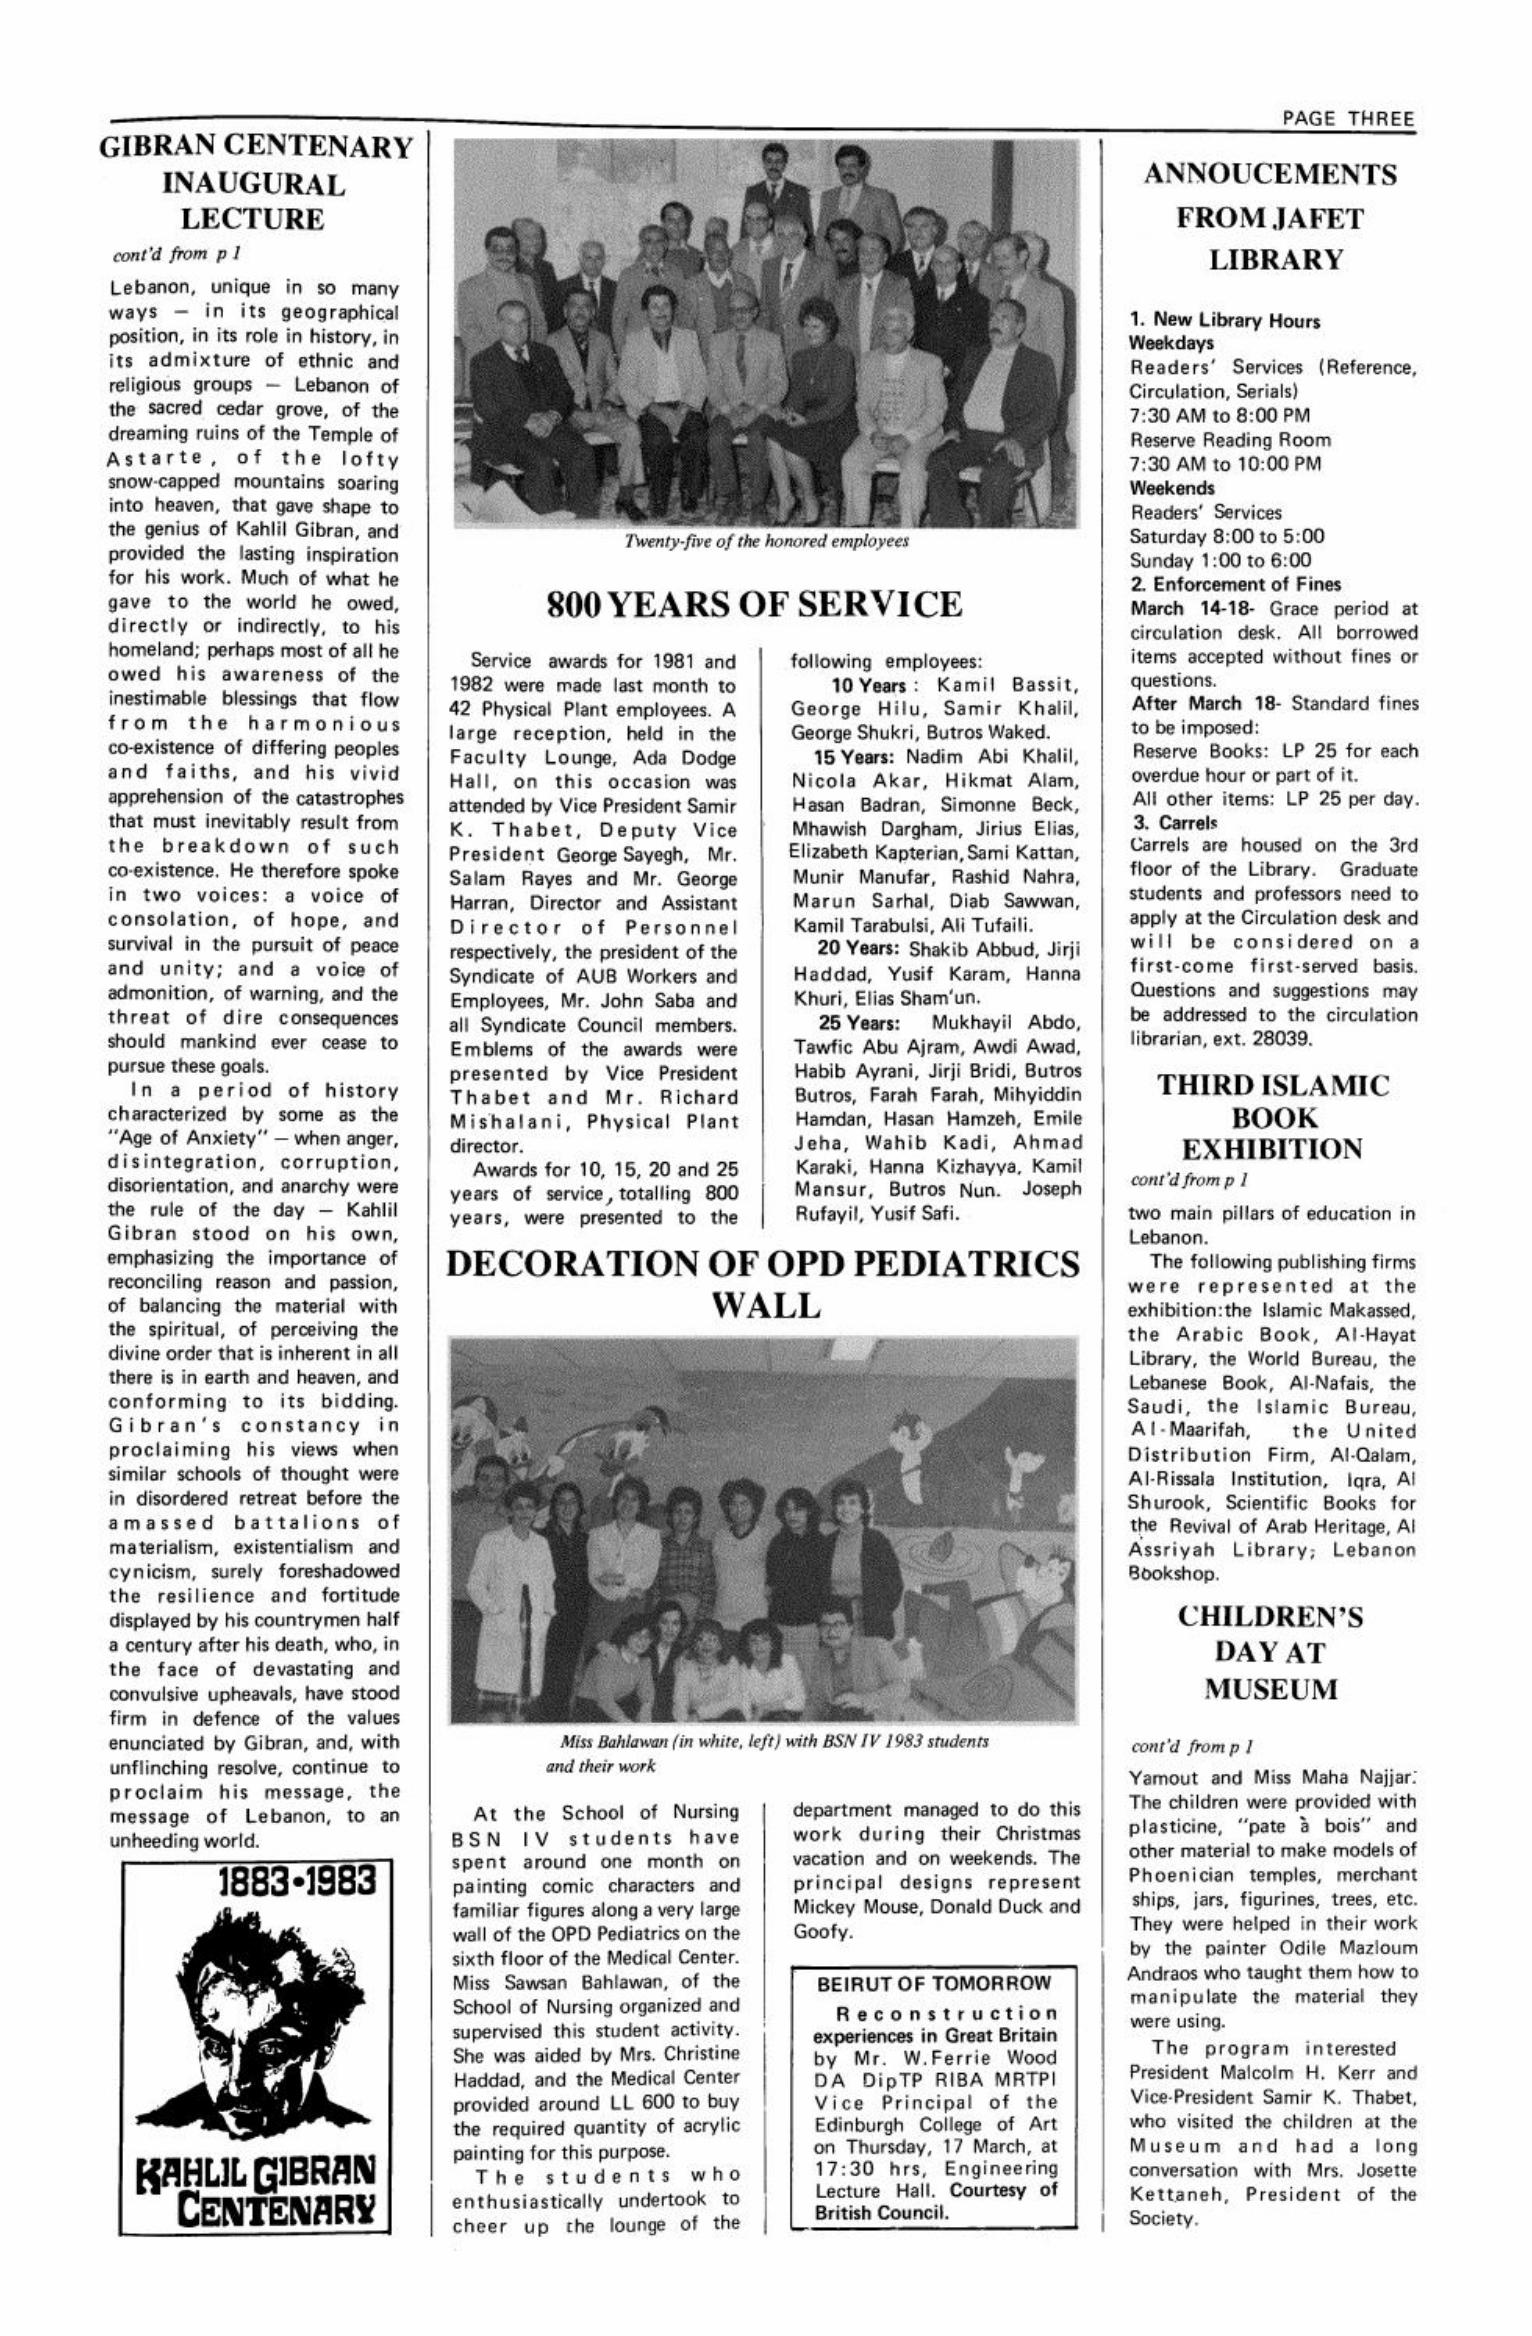 Professor Bushrui Explains Gibran's Centenary, American University of Beirut Bulletin, 25, 9, Mar 7, 1983, pp. 1-3,4.